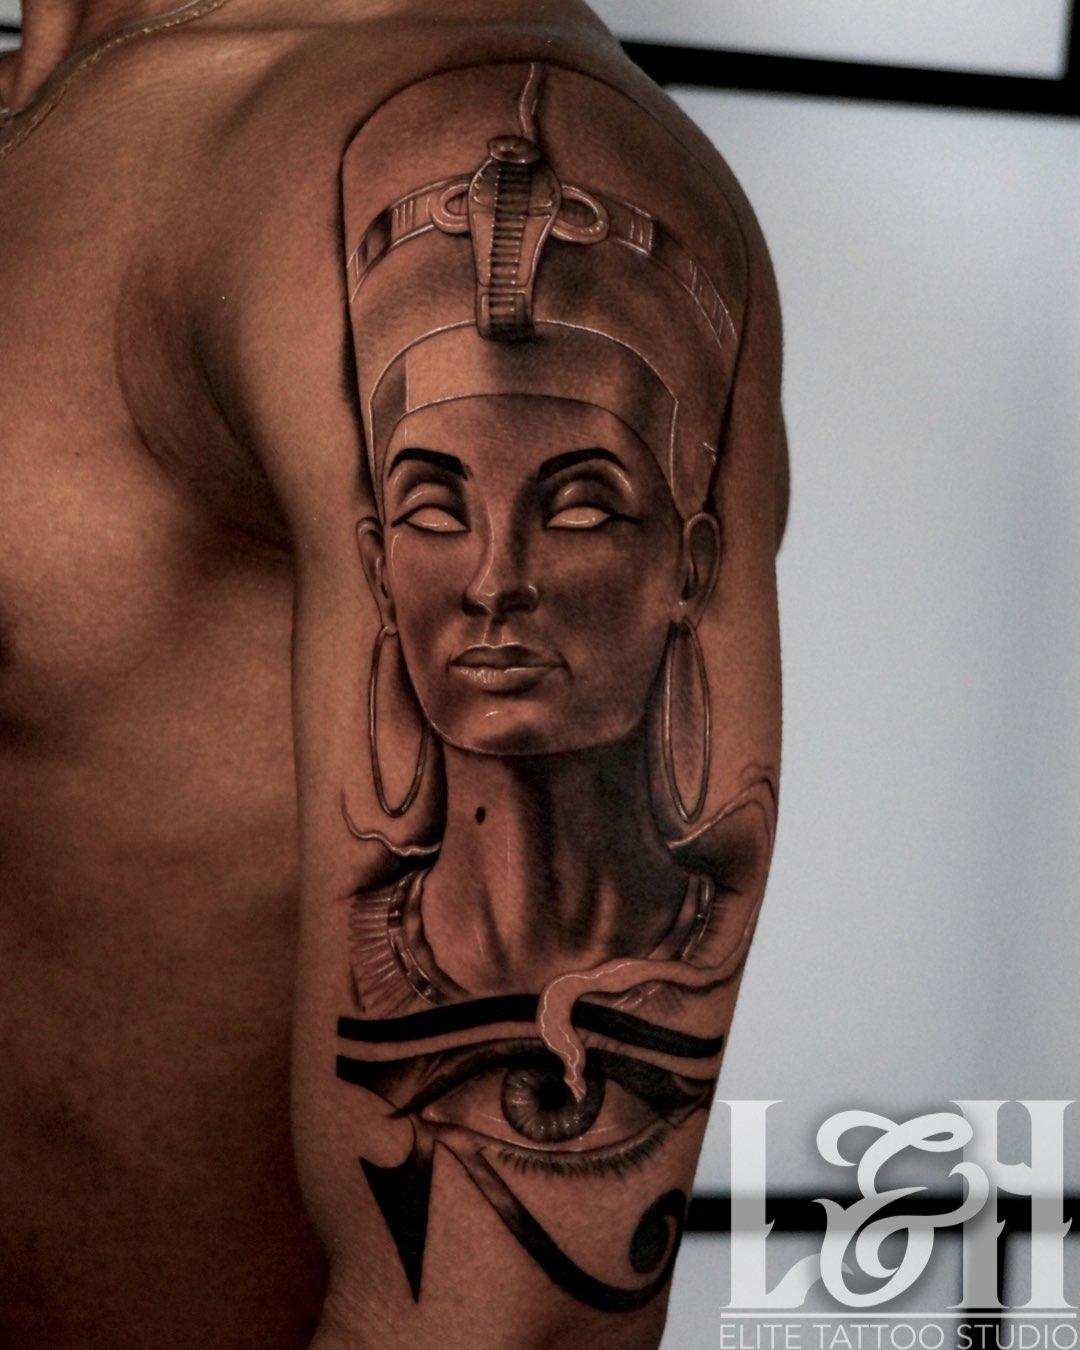 Queen Nefertiti Tattoo: Black And Grey Portrait Queen Nefertiti Tattoo